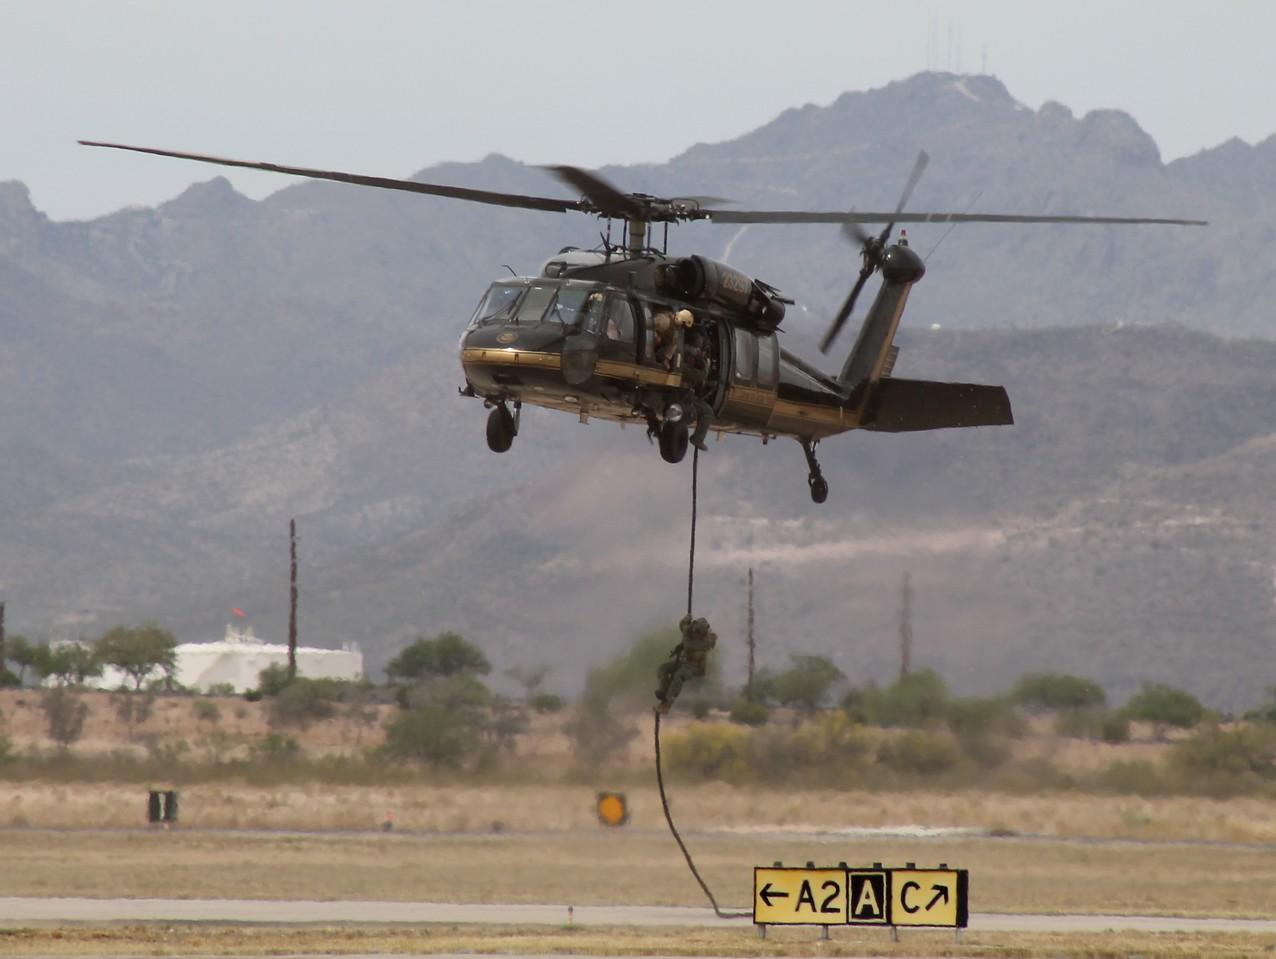 U.S. Customs & Border Protection at Davis-Monthan AFB Tucson, AZ - 4-12-2014